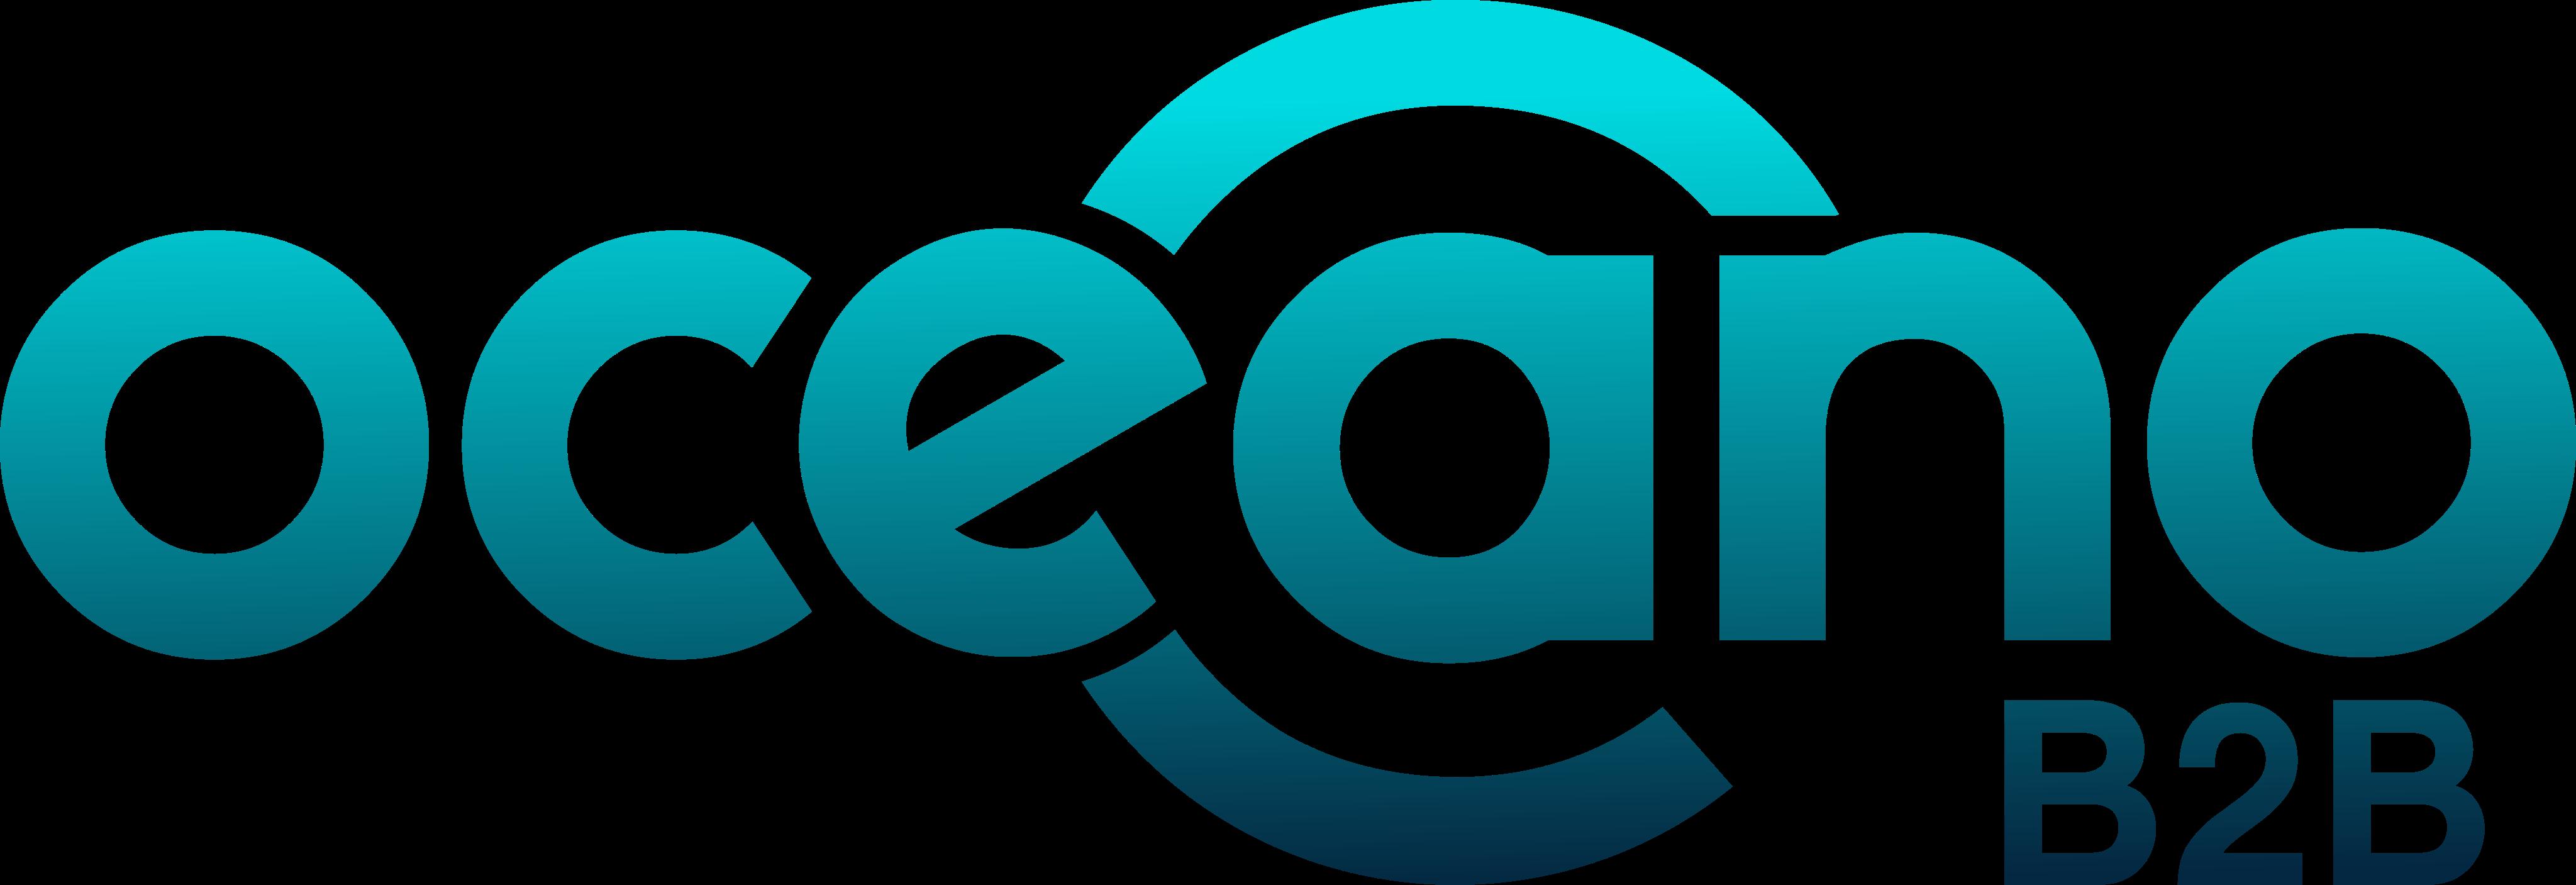 Oceano B2b Logo.